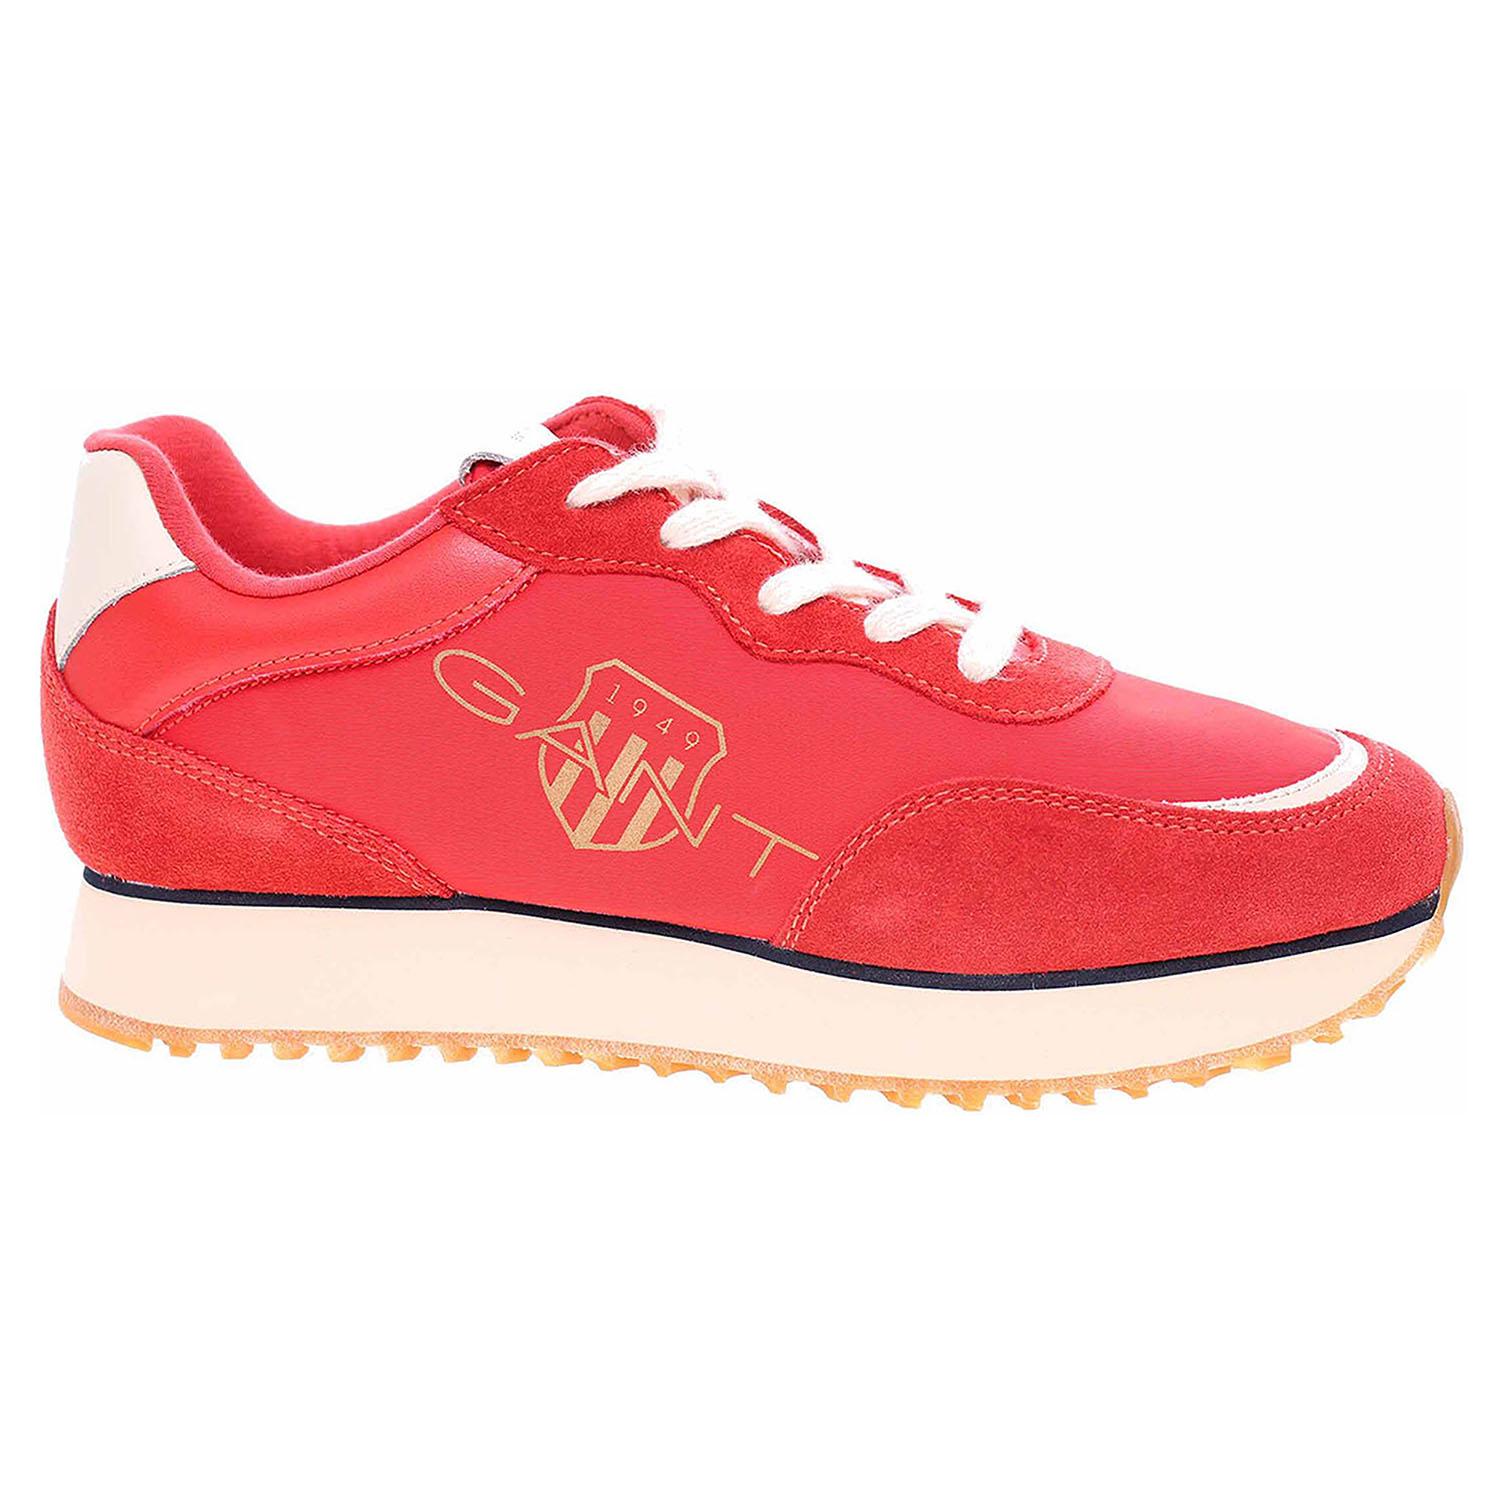 Dámská obuv Gant Bevinda 21533838 G51 red 21533838 G51 39